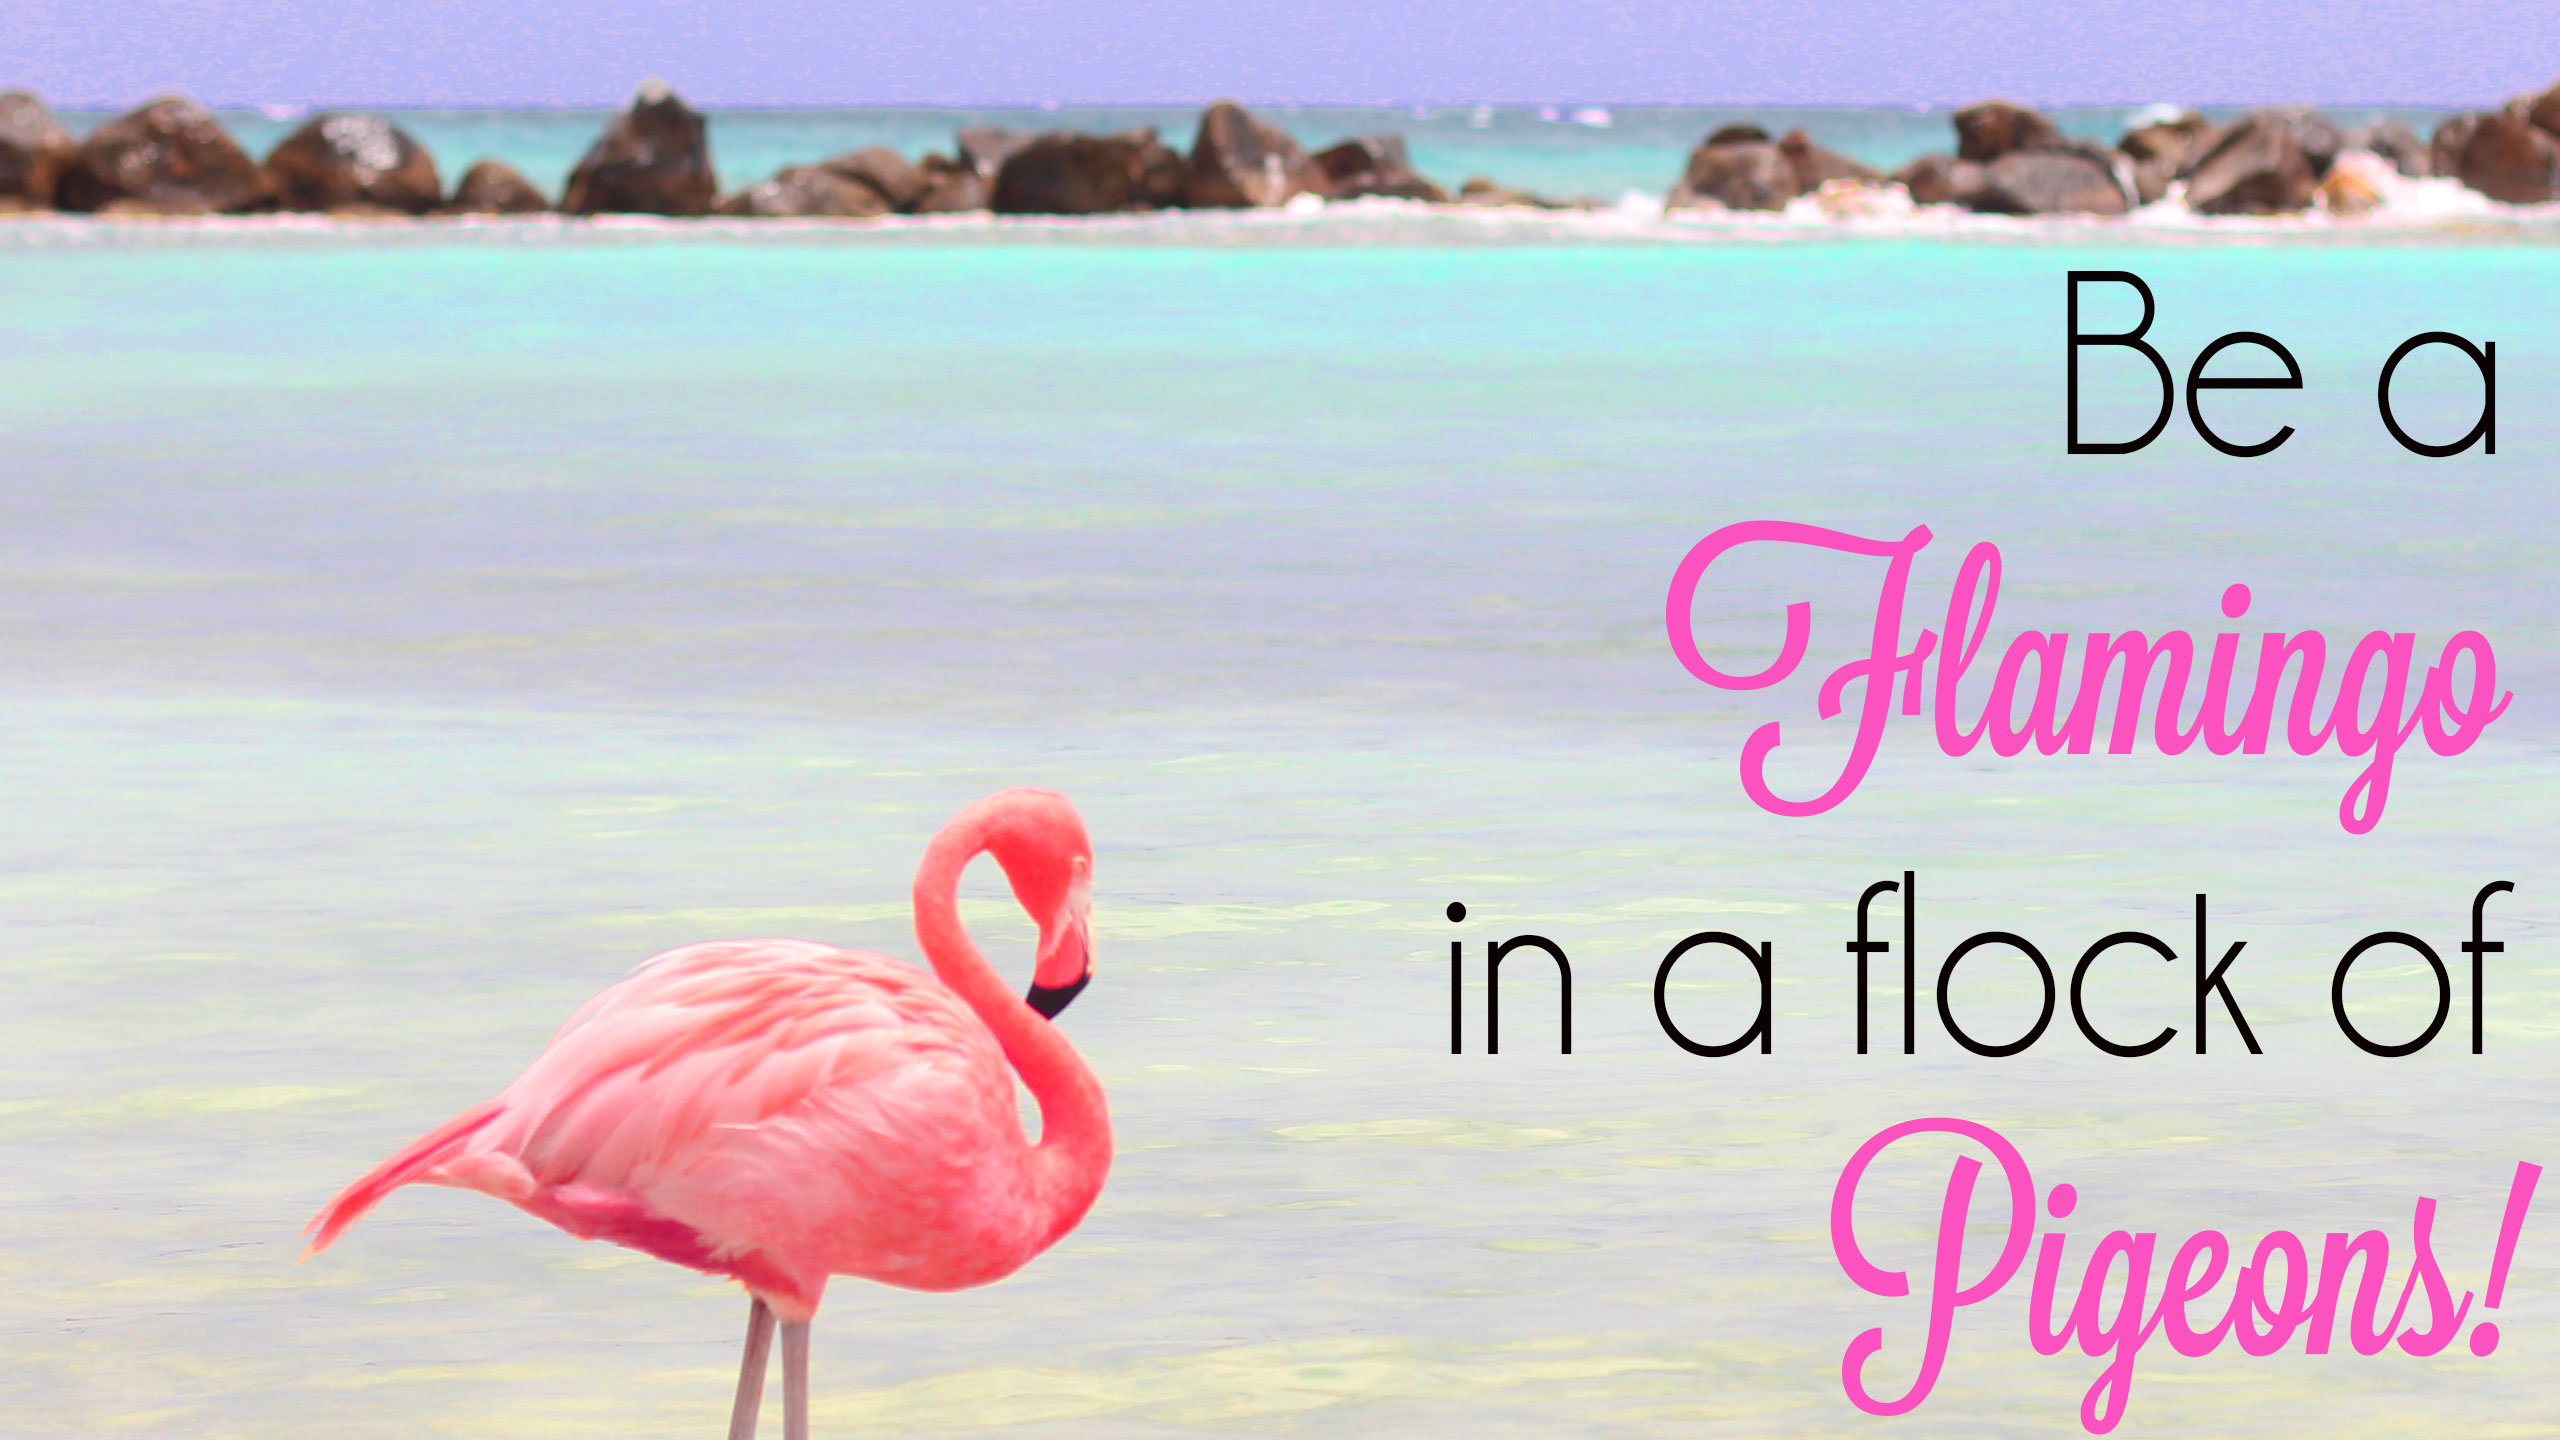 Mobile Wallpaper Inspirational Quotes Free Download Flamingo Wallpapers Pixelstalk Net